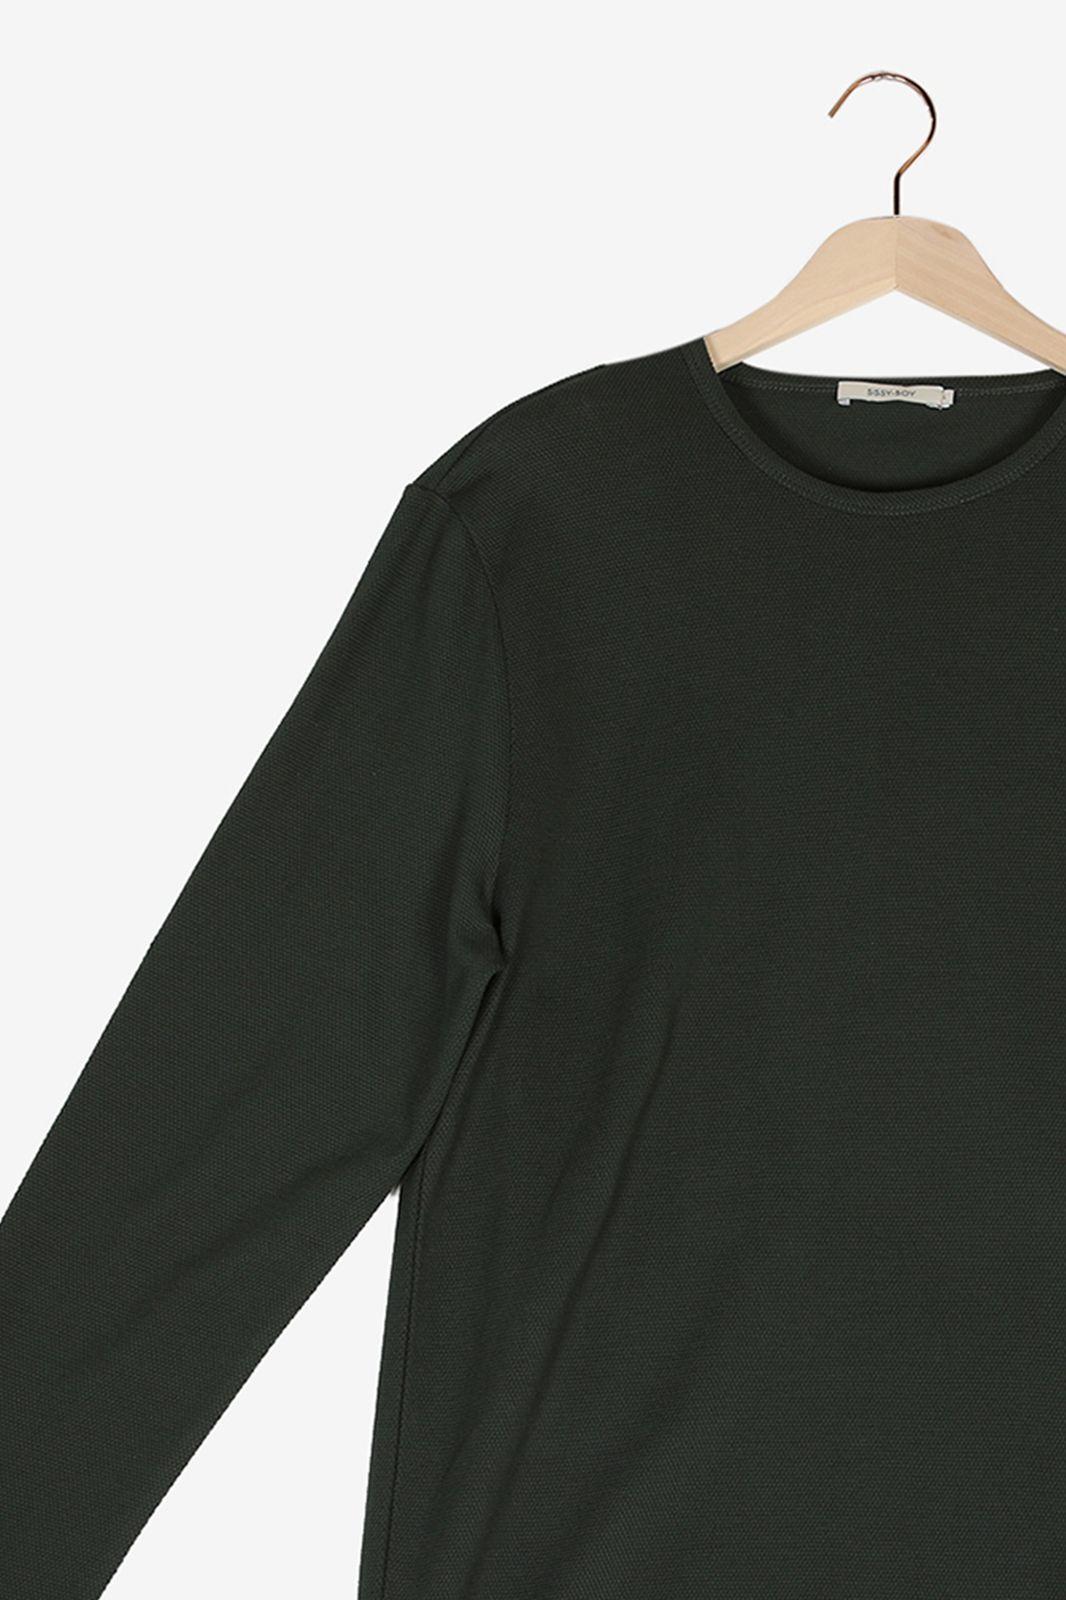 Groen T-shirt lange mouwen